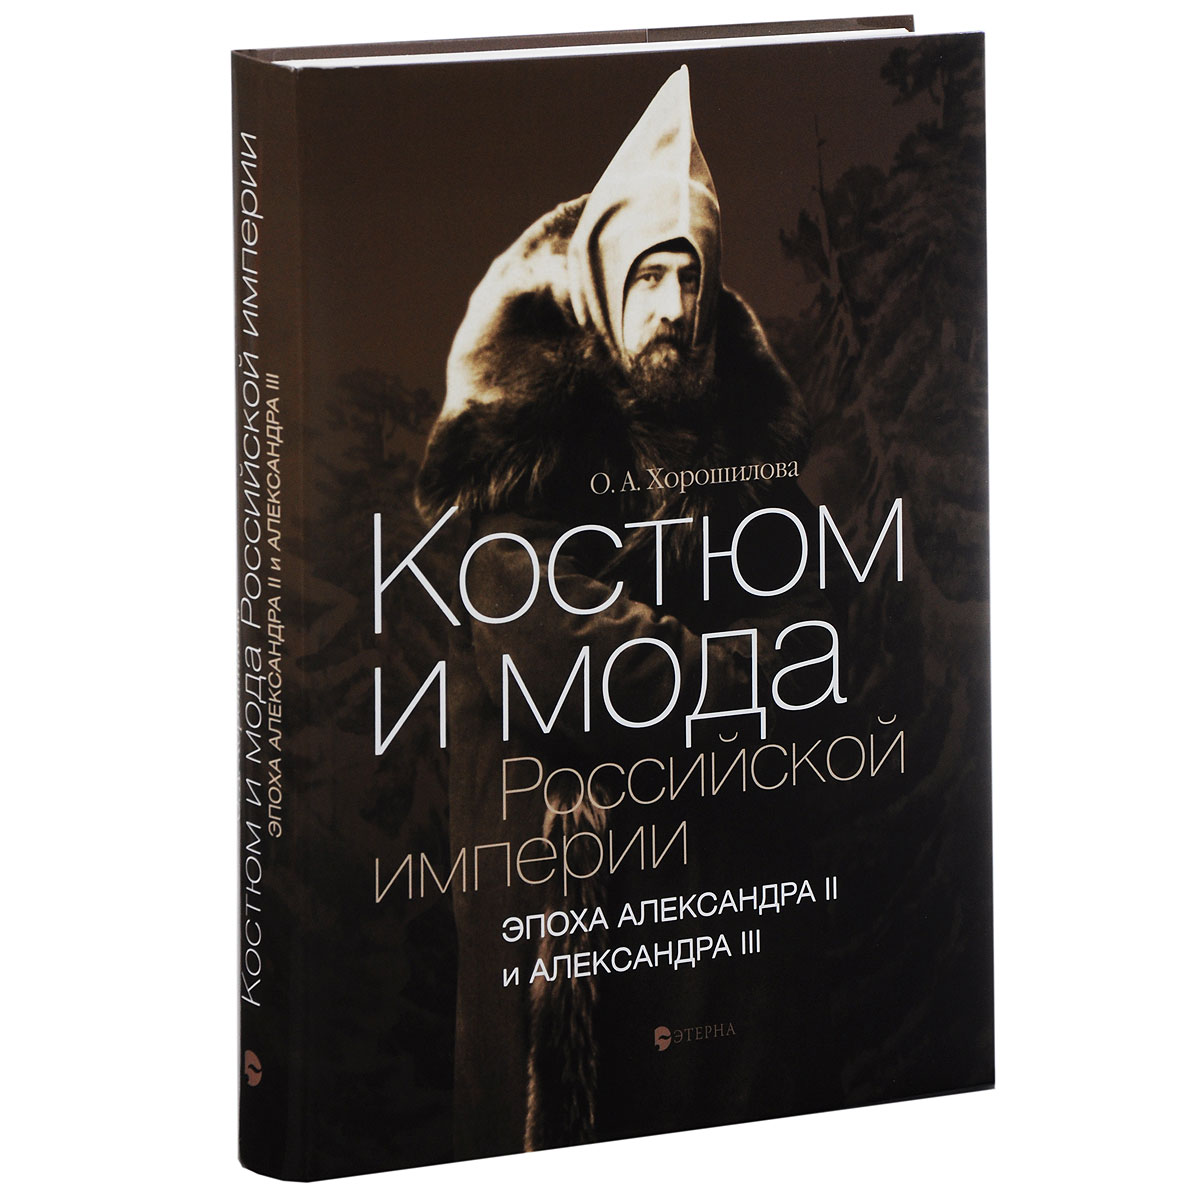 О. А. Хорошилова Костюм и мода Российской империи. Эпоха Александра II и Александра III